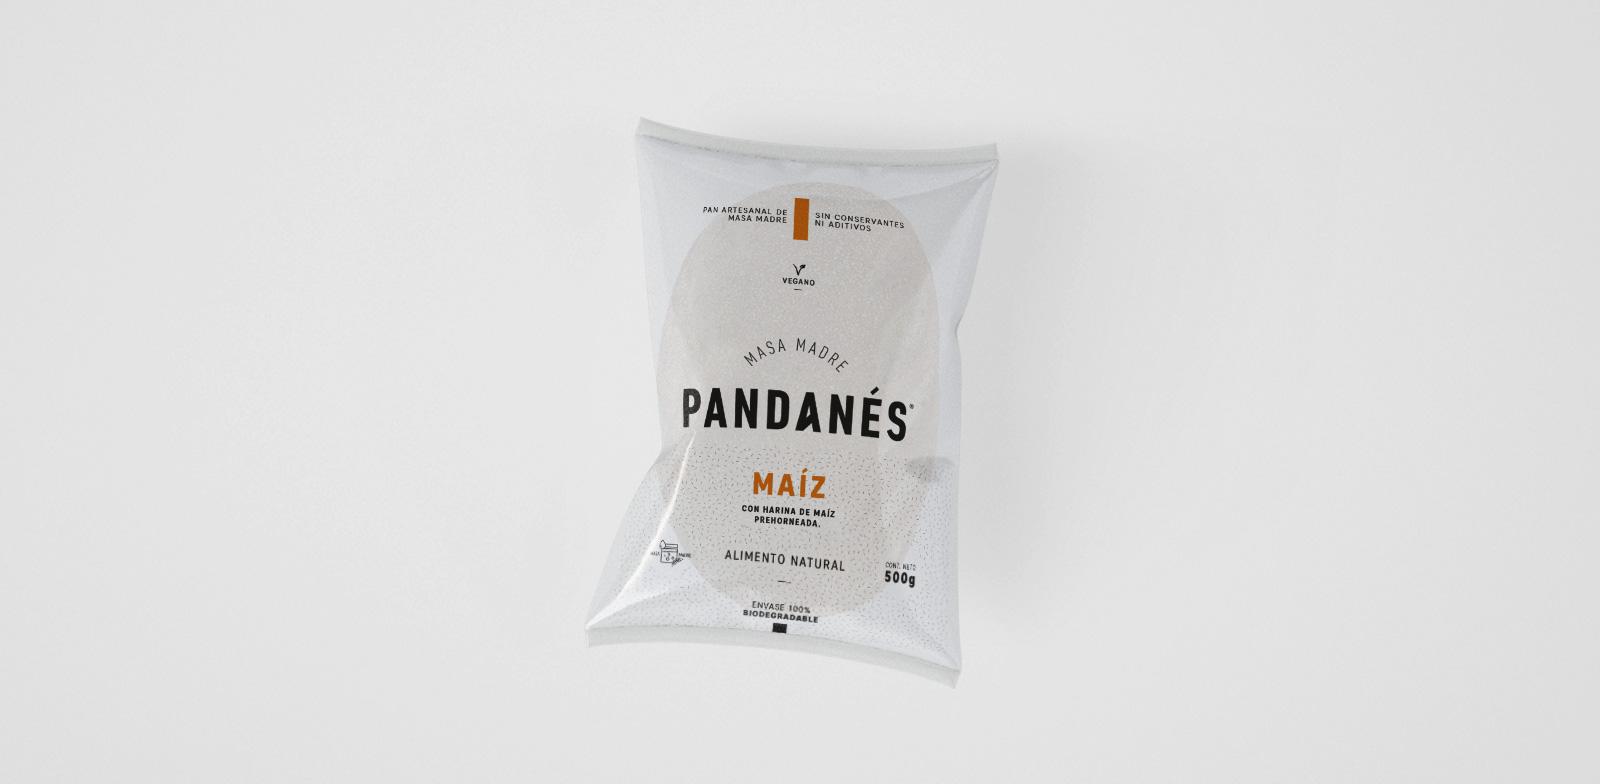 pandanes-pack-mock